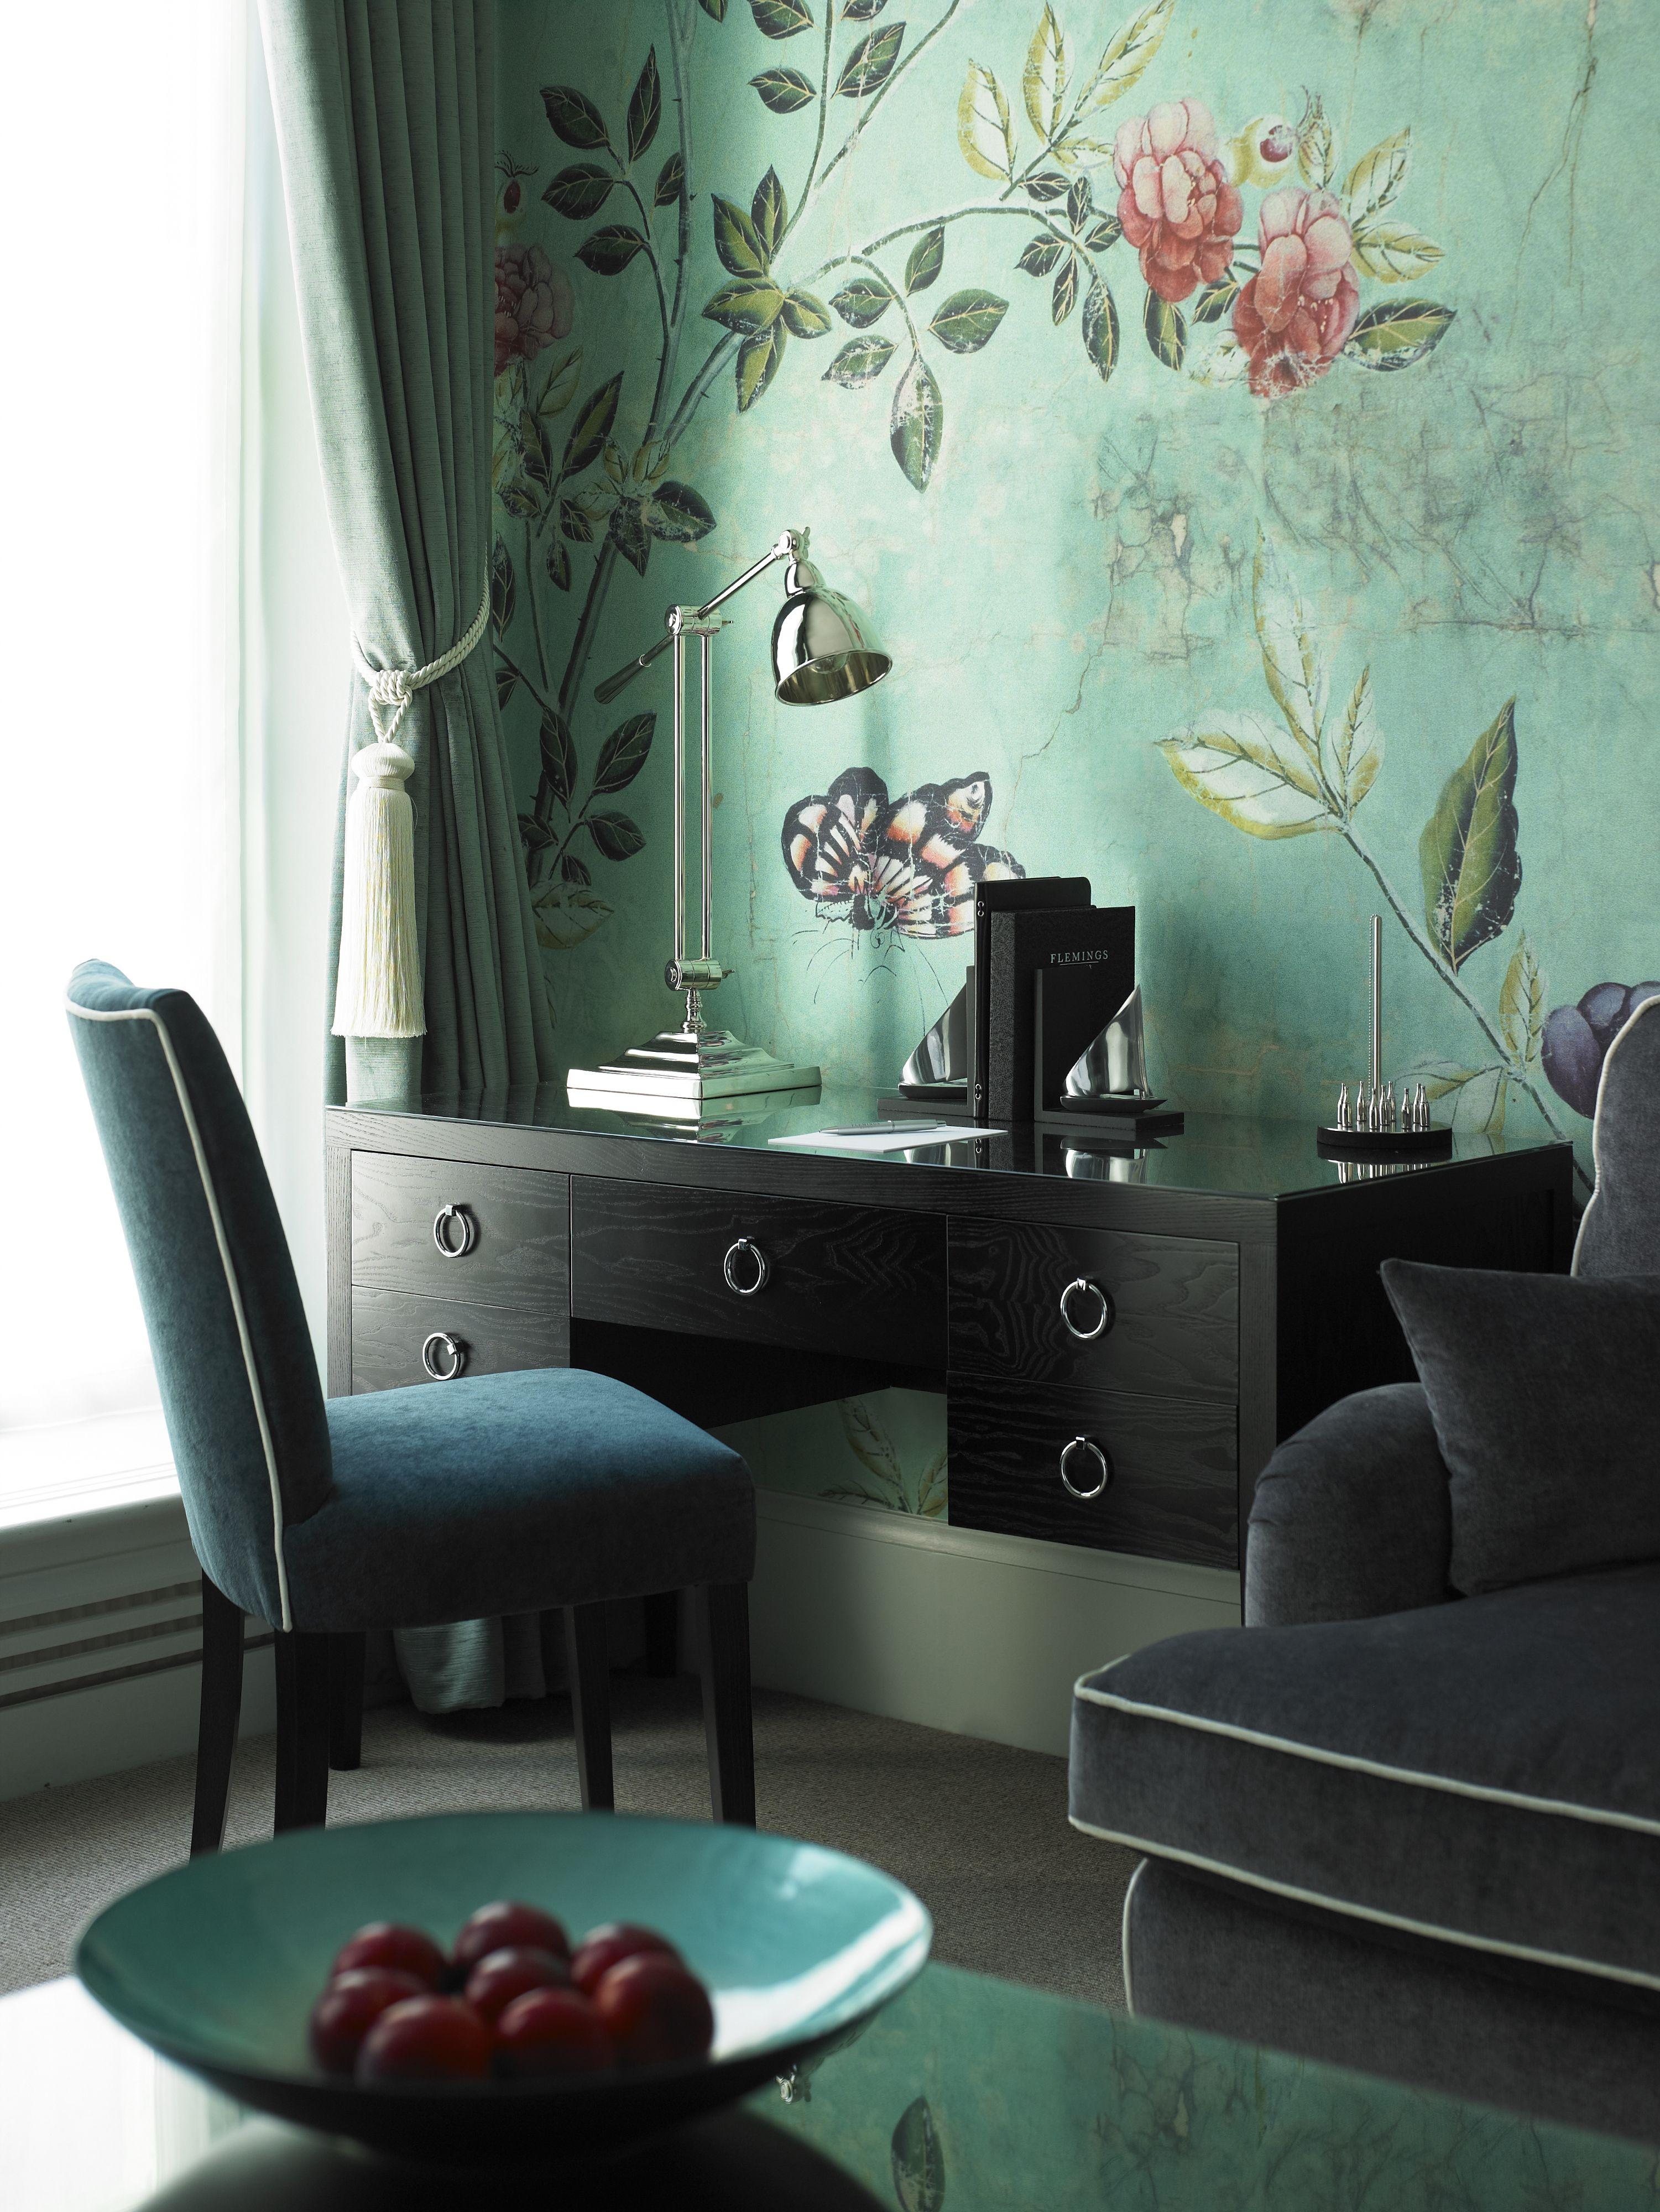 Flemings Mayfair Suites & Apartments Launch Party #Luxury #LivingRoom #Design